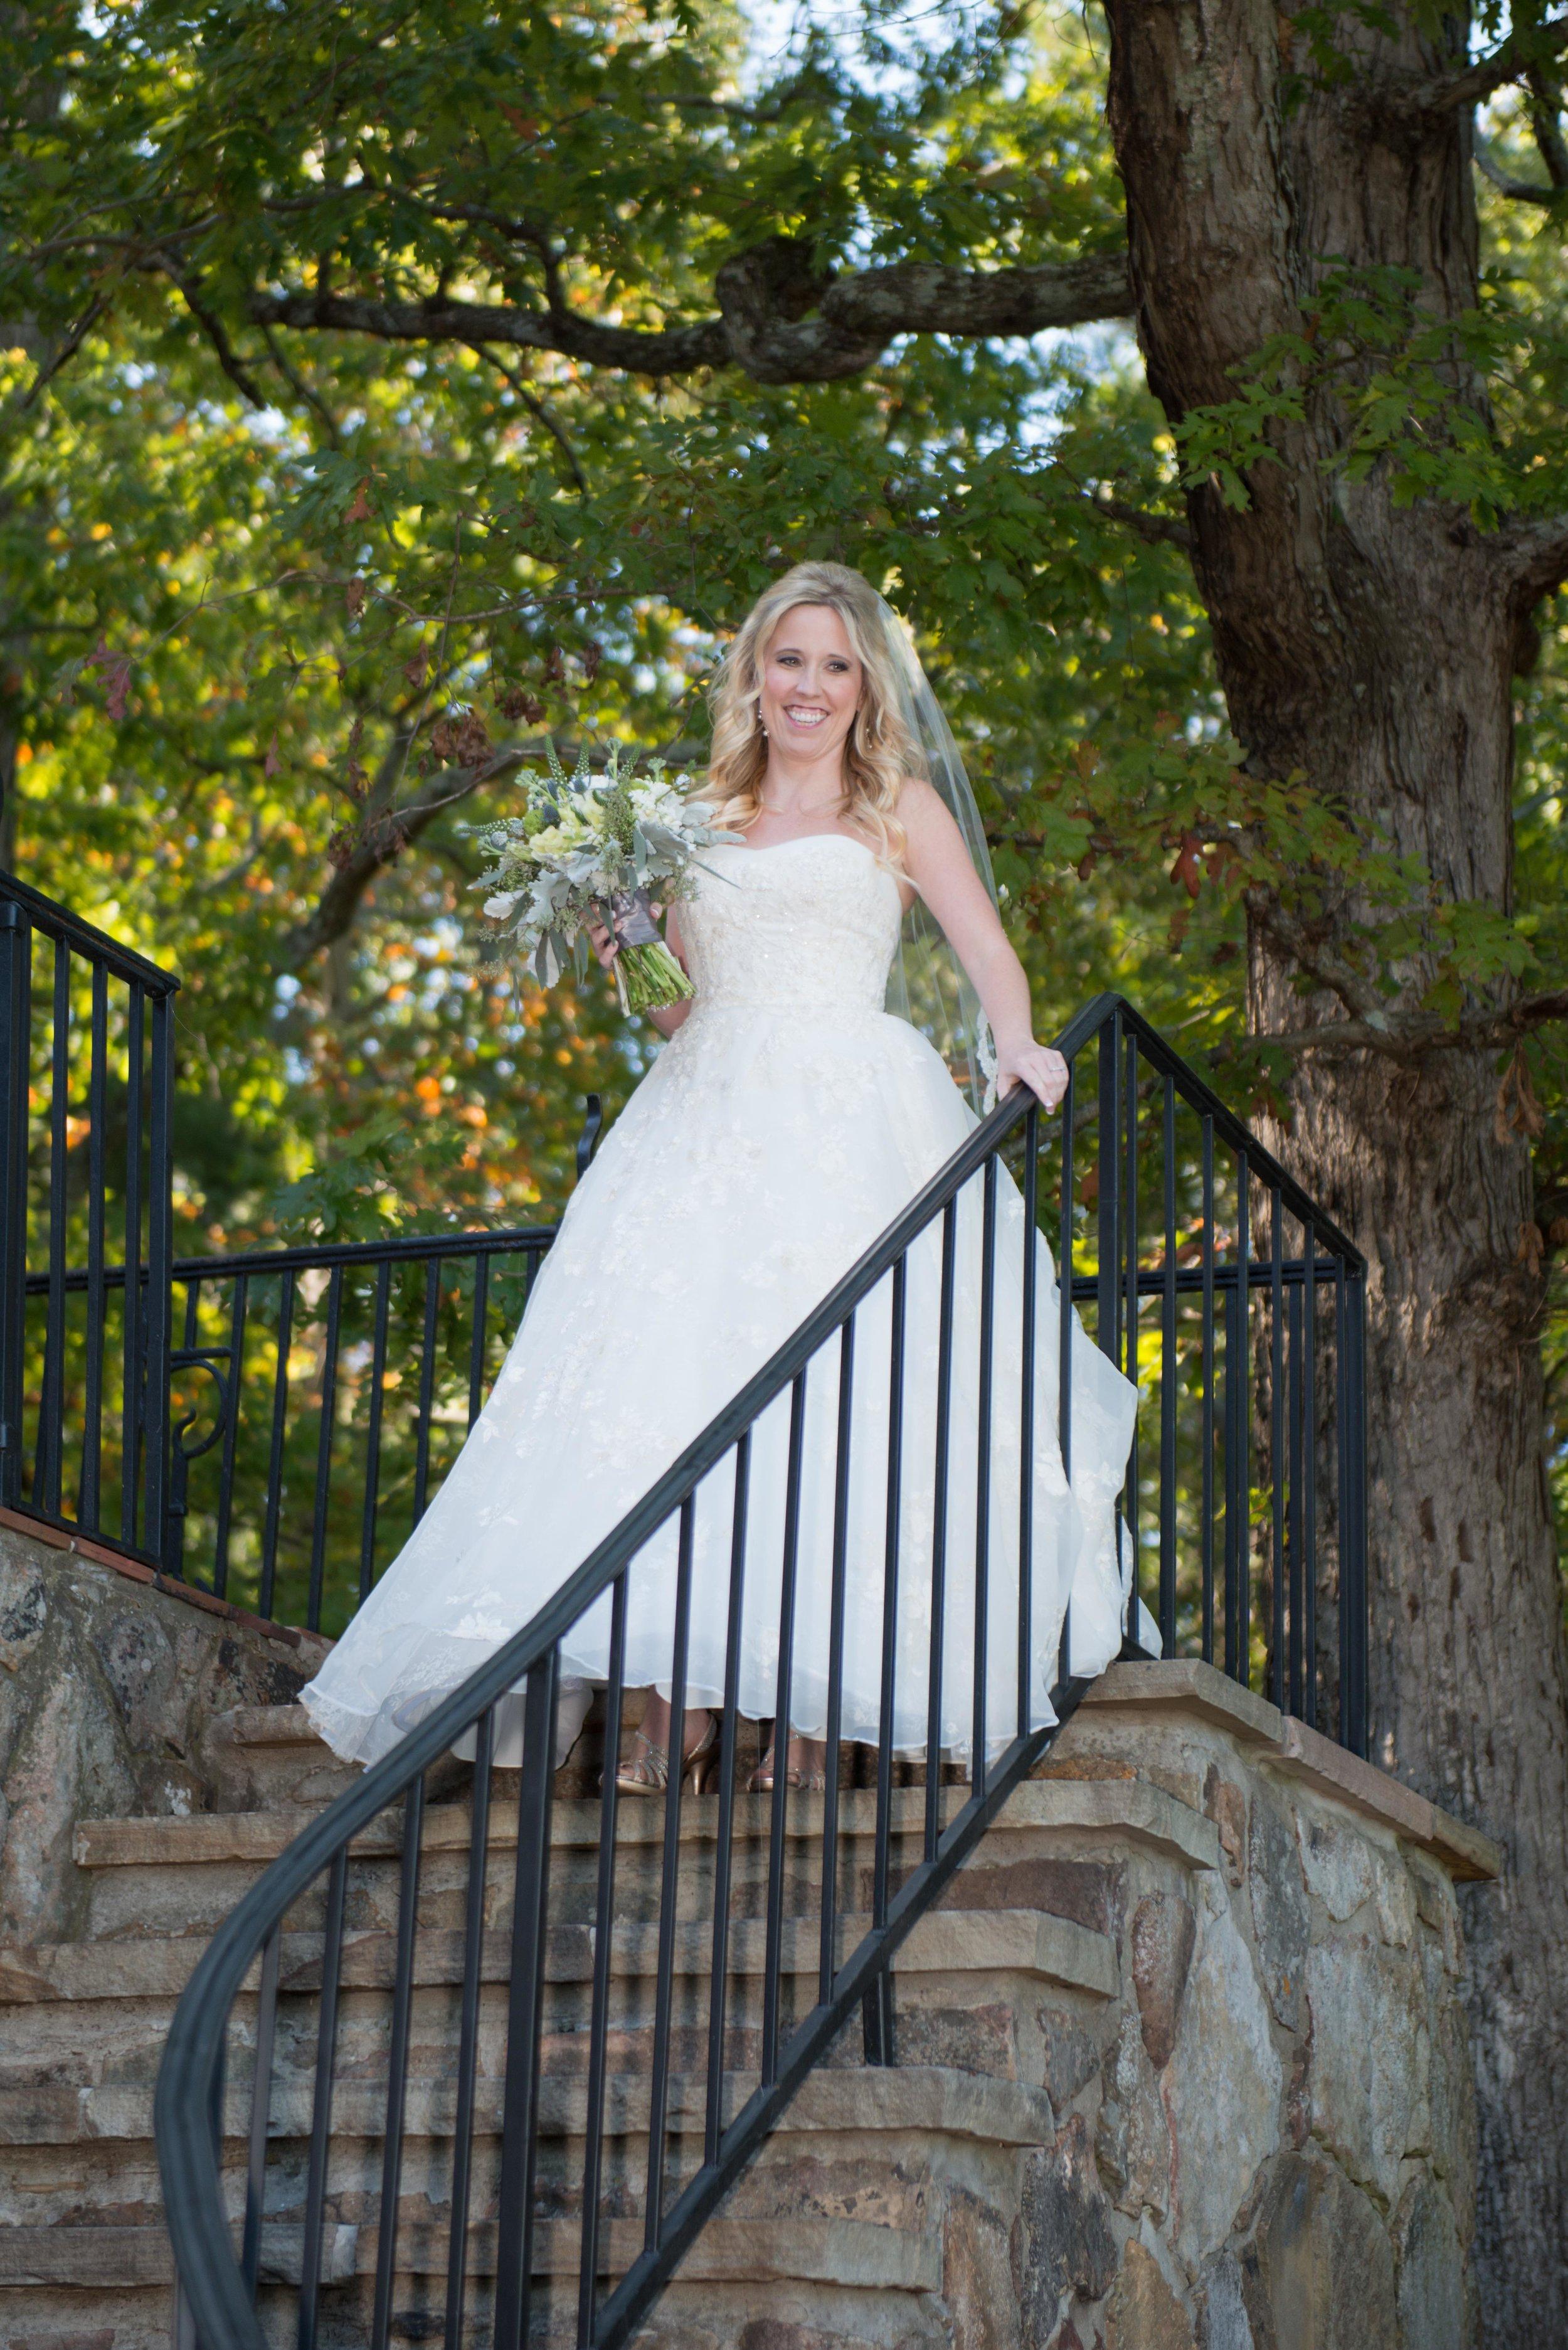 00001_Kuhnert-Wedding-42.jpg